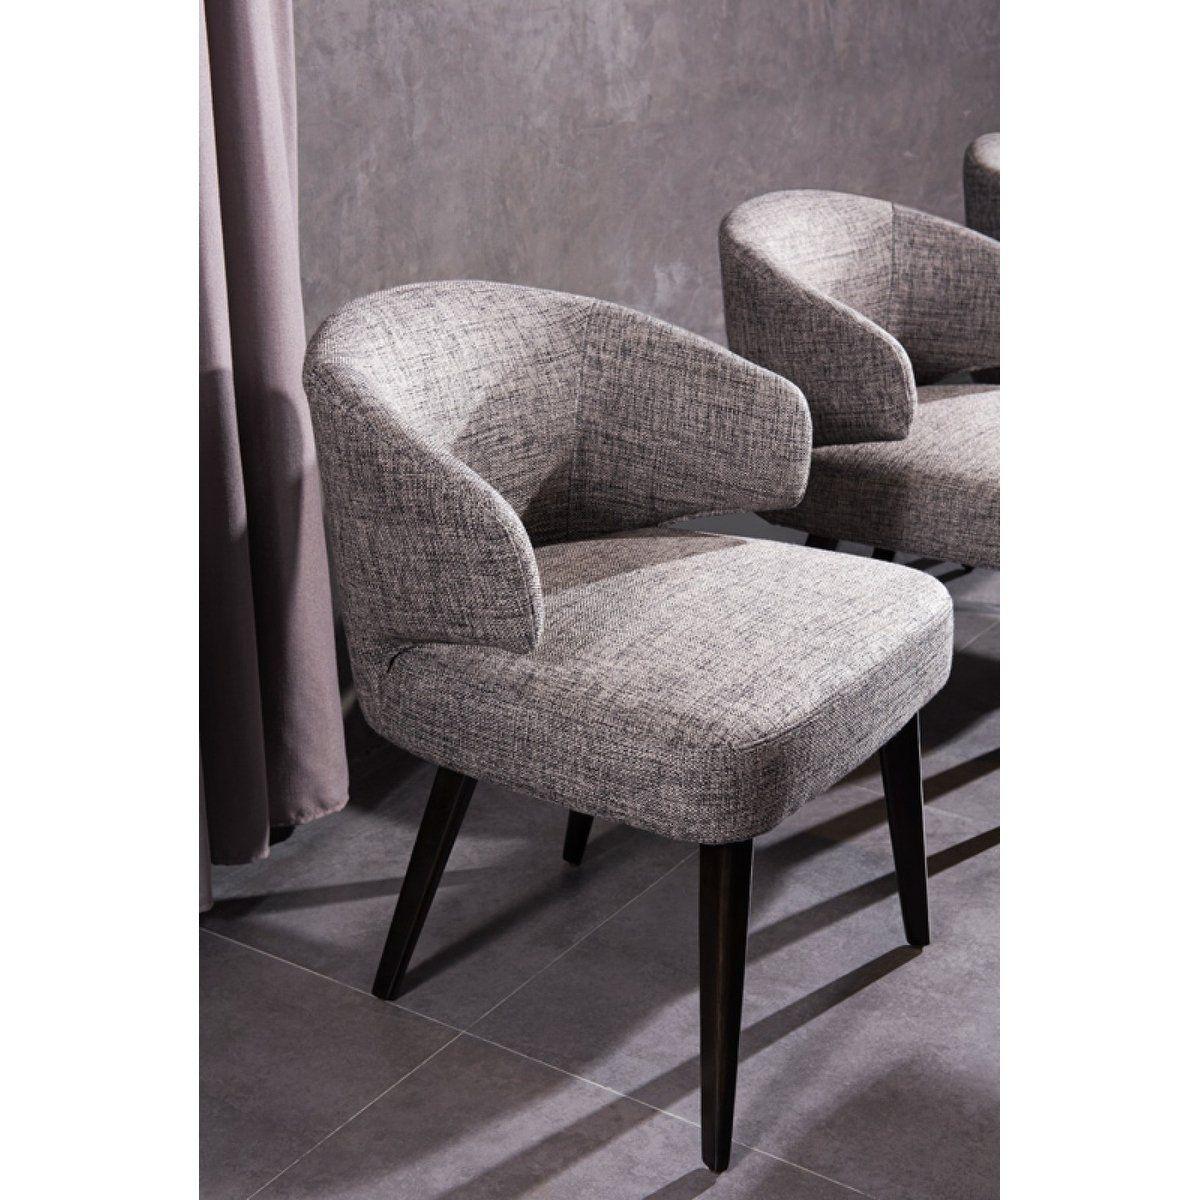 Our Best Dining Room Bar Furniture Deals Dining Chairs Fabric Dining Chairs Wooden Dining Chairs